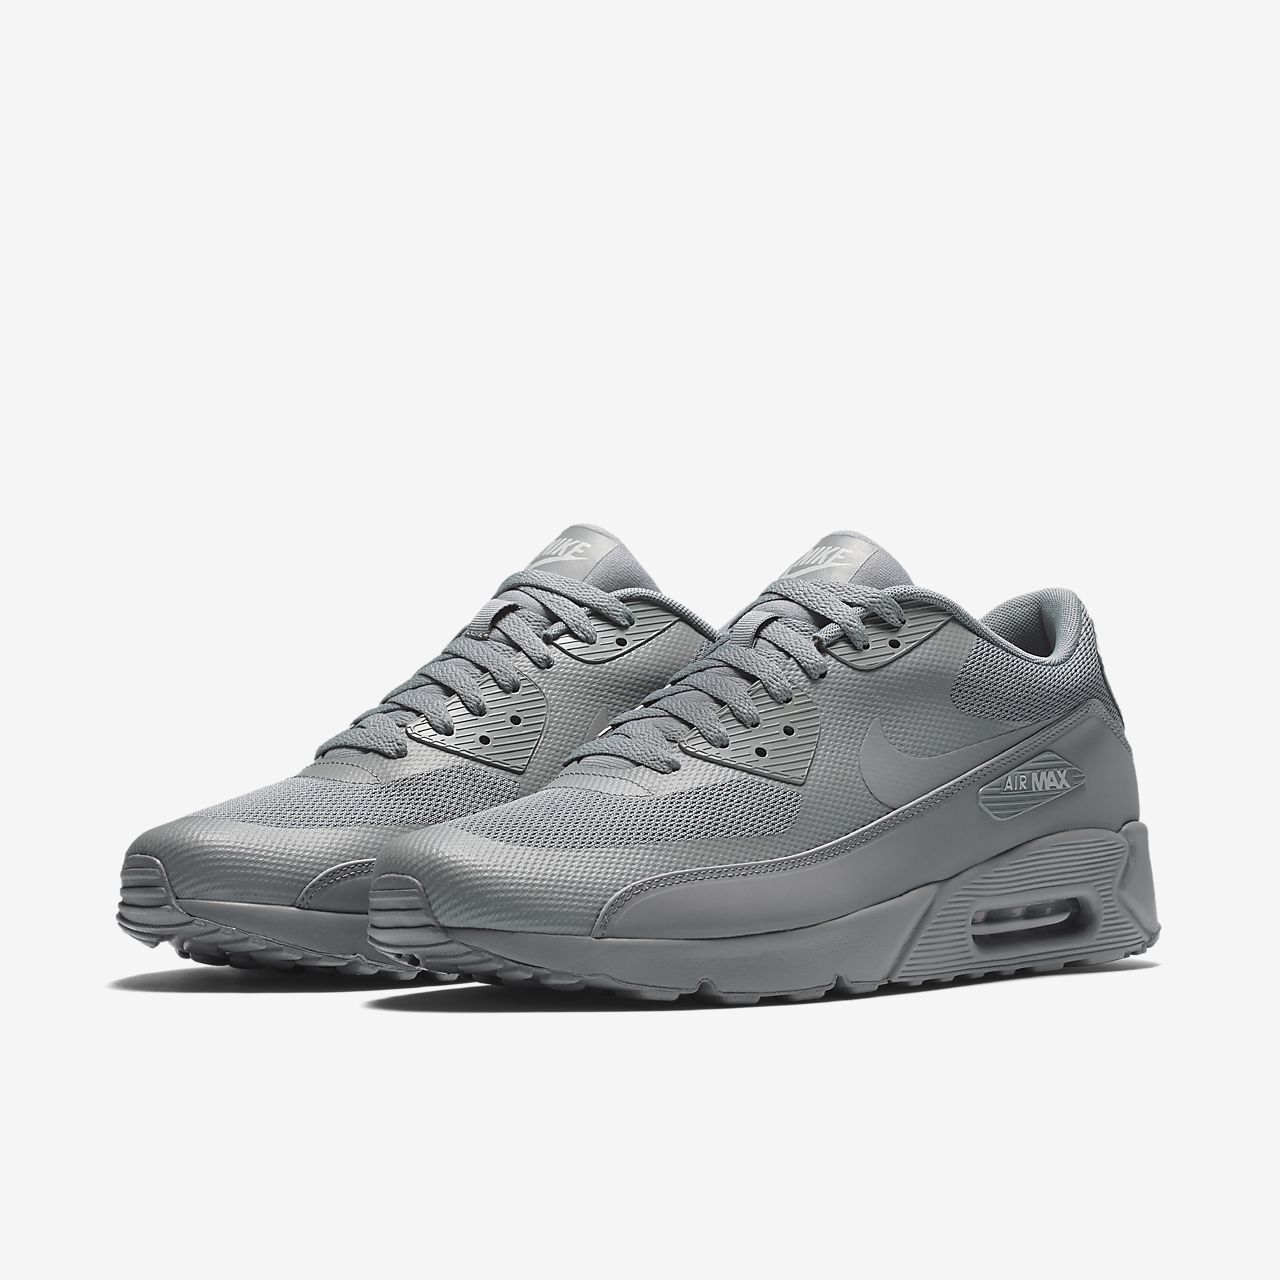 ... Nike Air Max 90 Ultra 2.0 Essential Mens Shoe